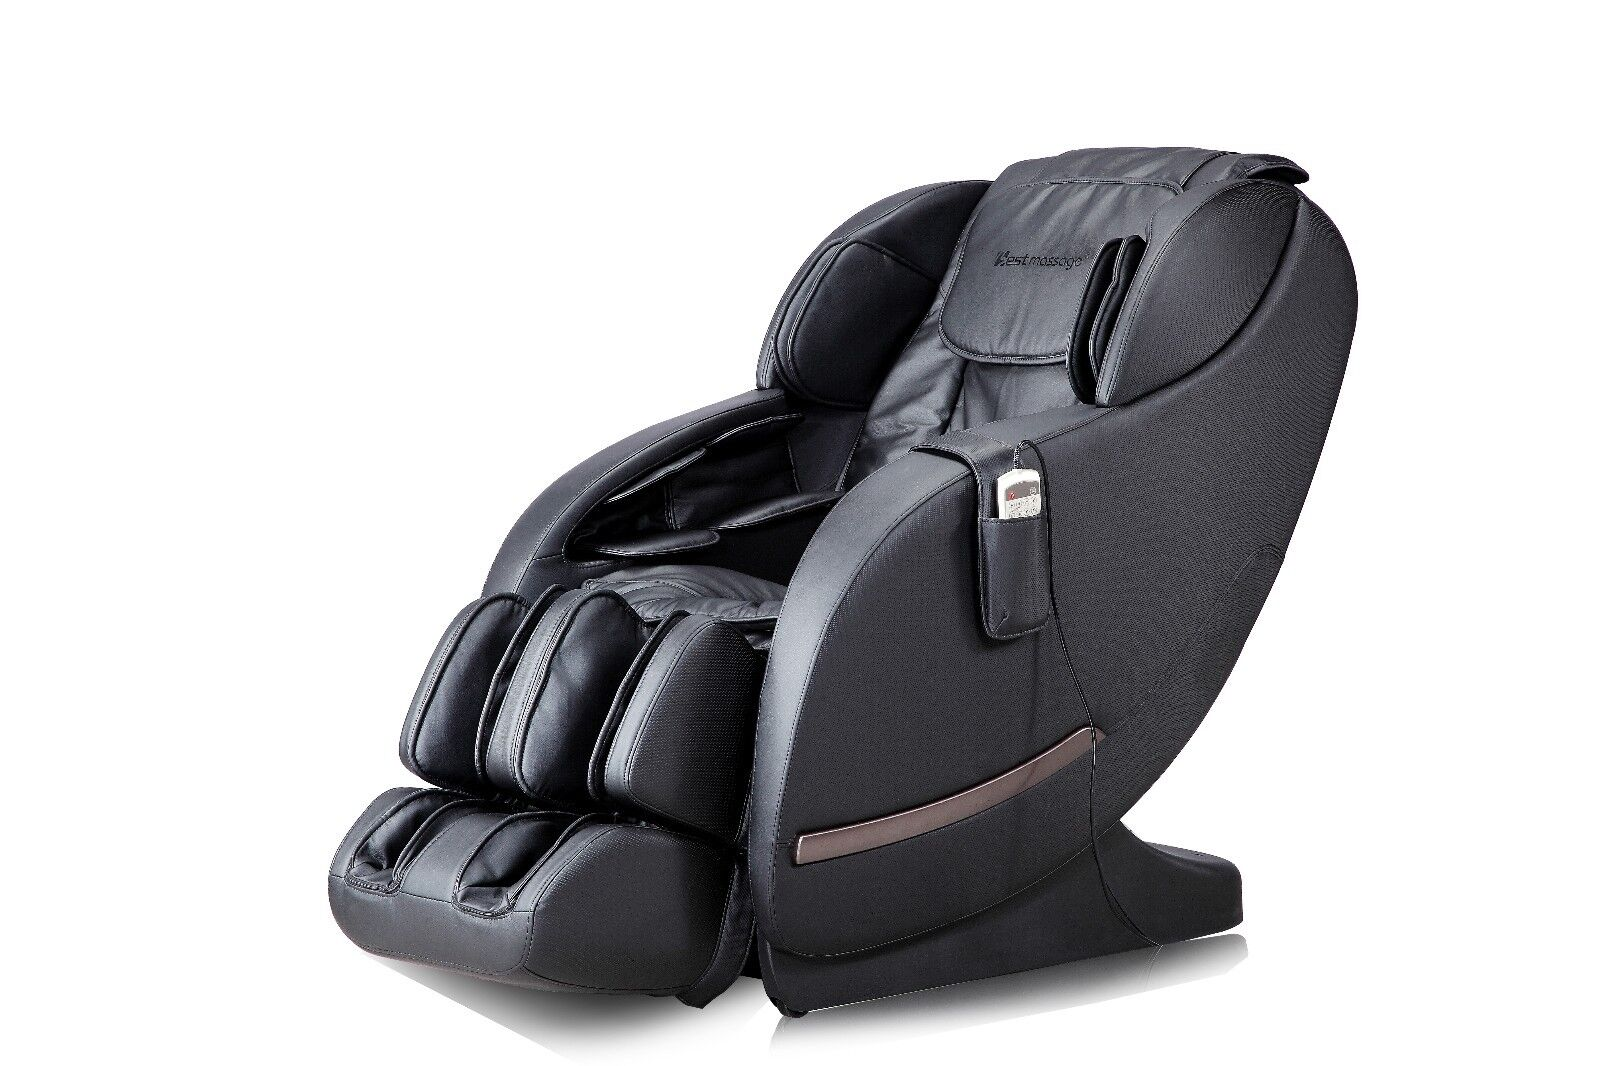 BestMassage Electric Full Body Massage Chair Foot Roller Zero Gravity w/Heat 190 Electric Massage Chairs